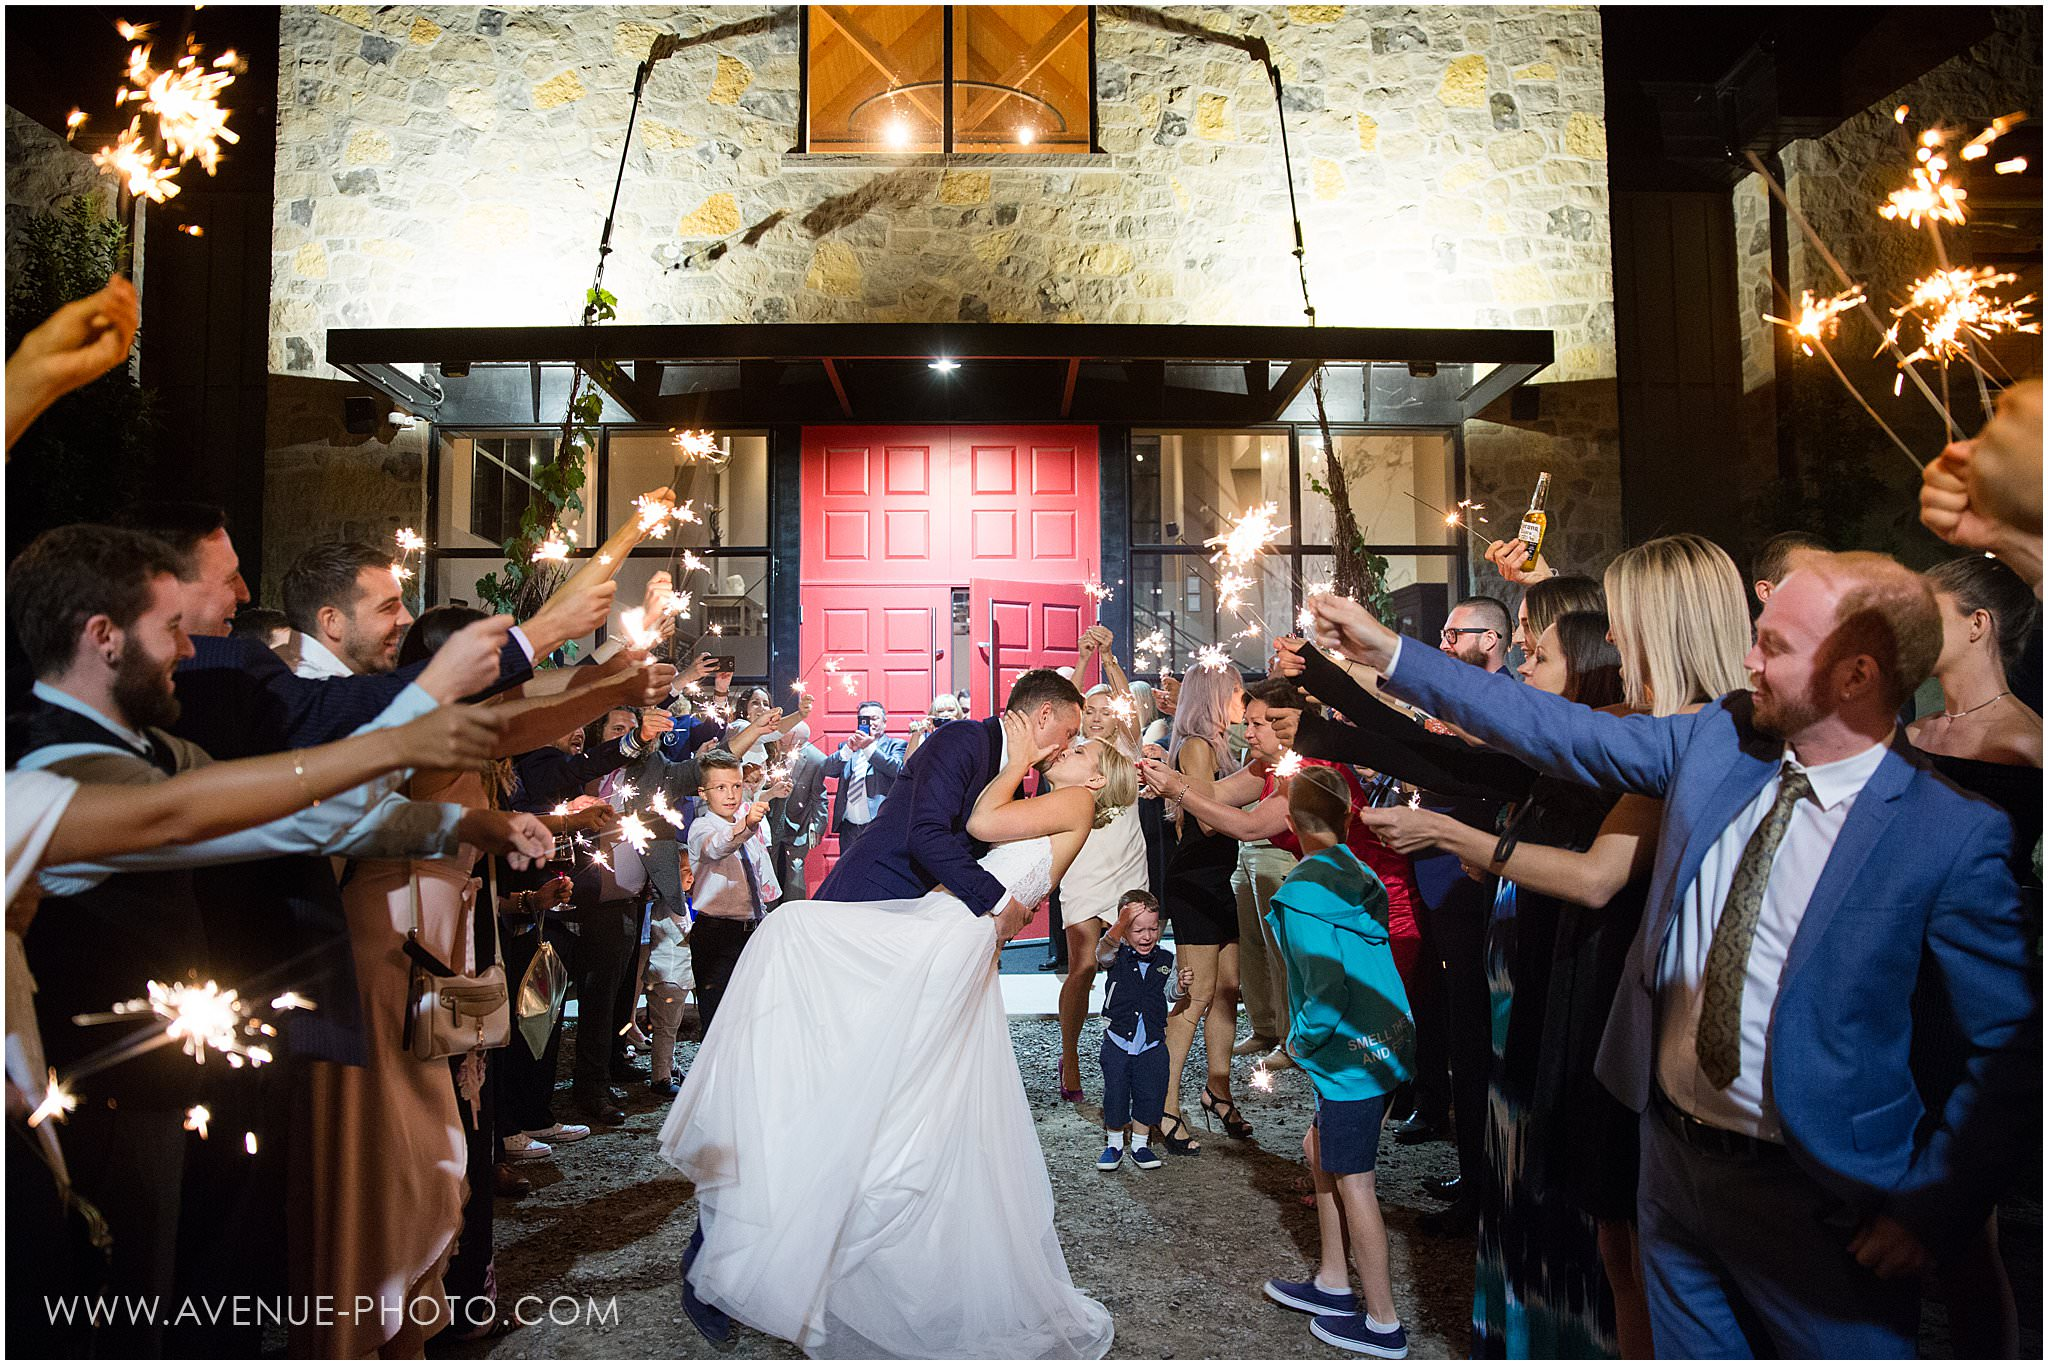 Adamo Estate Winery Wedding Photos, Sparkler Exit